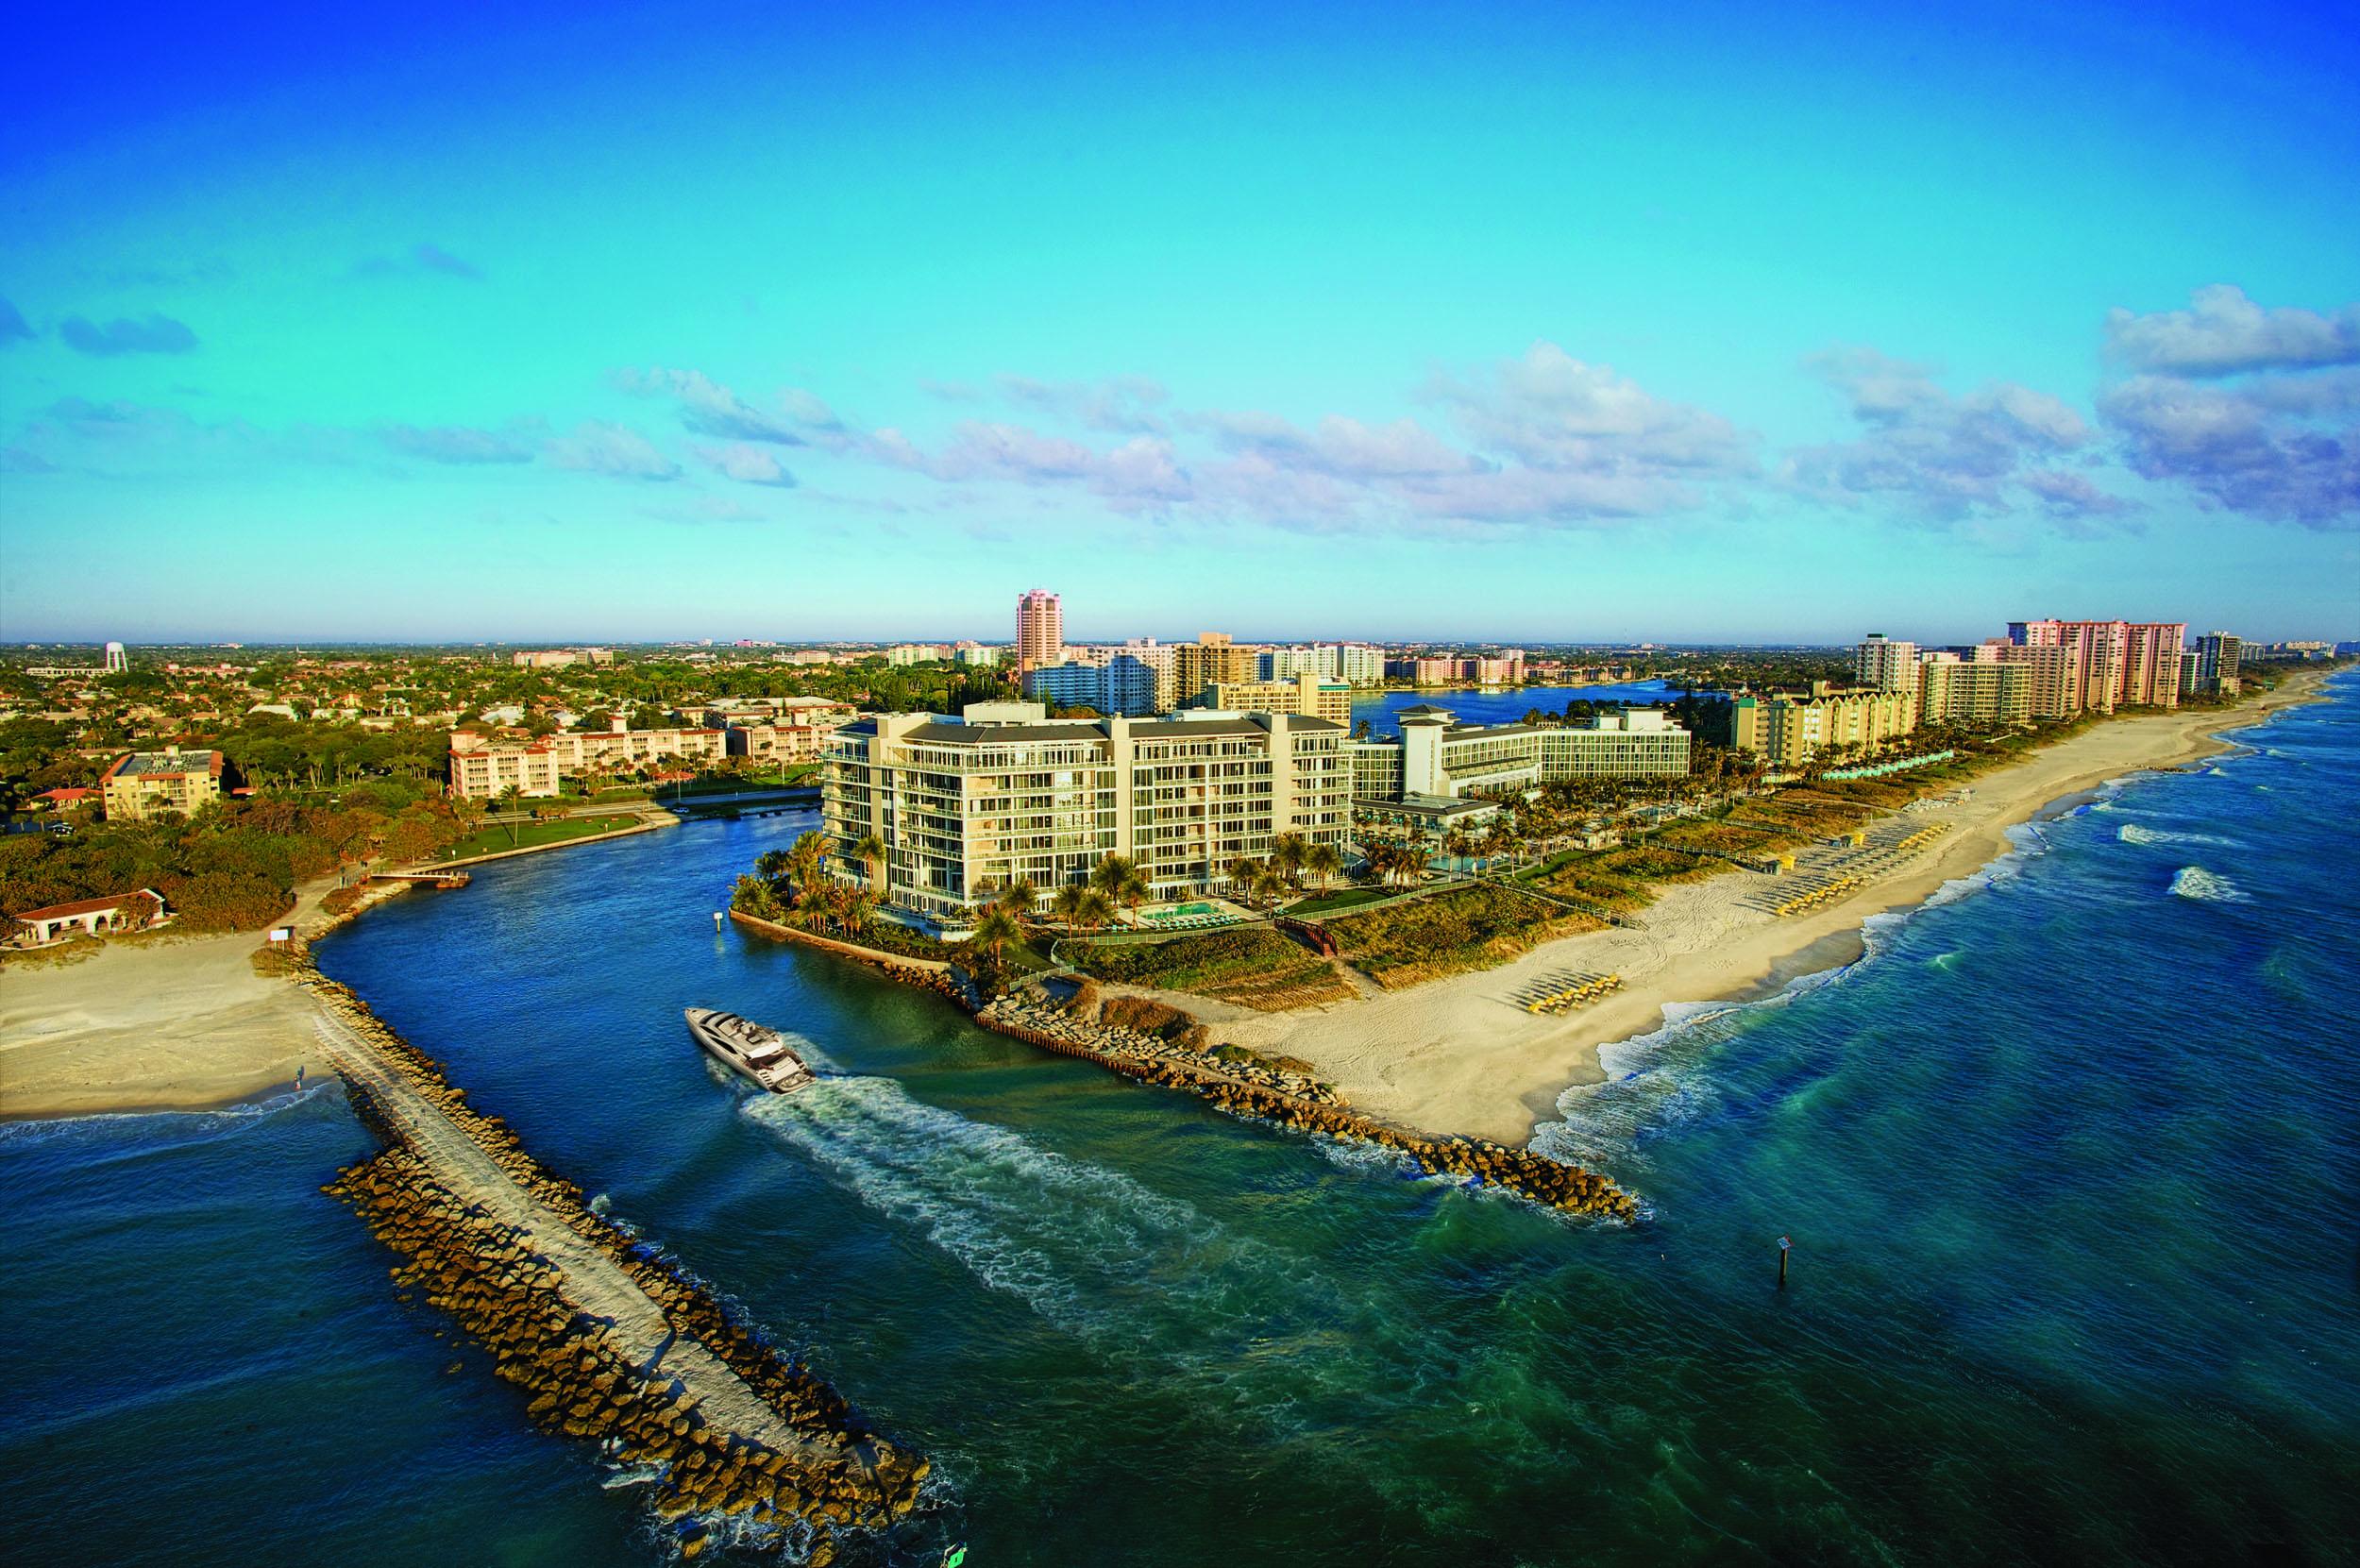 1000 S Ocean Boulevard 308  Boca Raton FL 33432